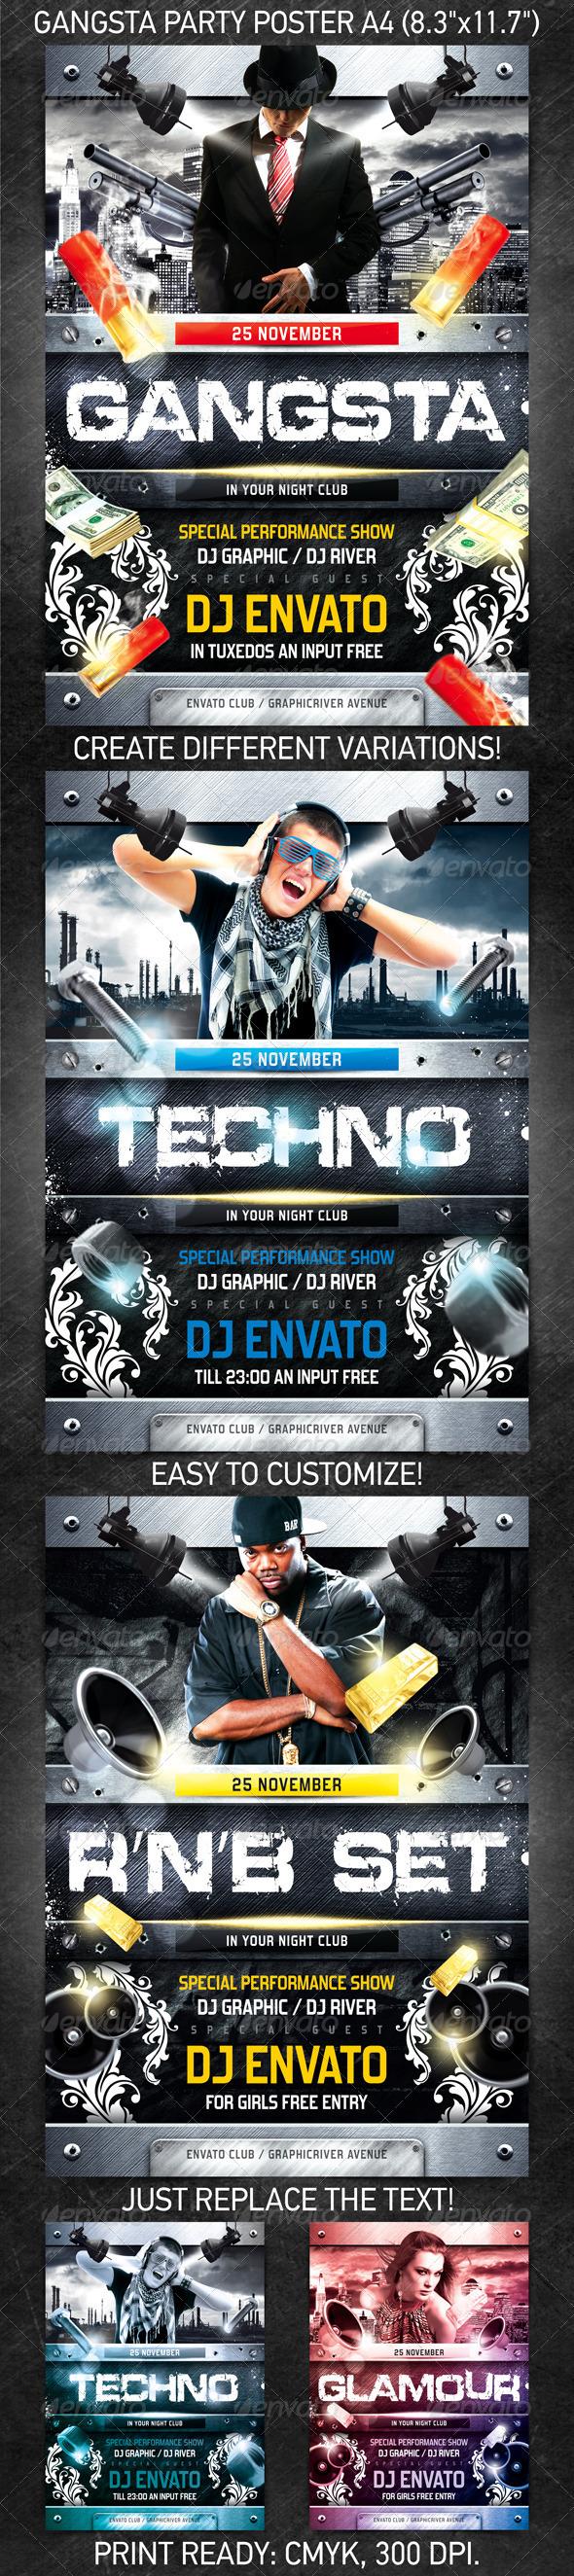 gangsta party poster psd template on behance